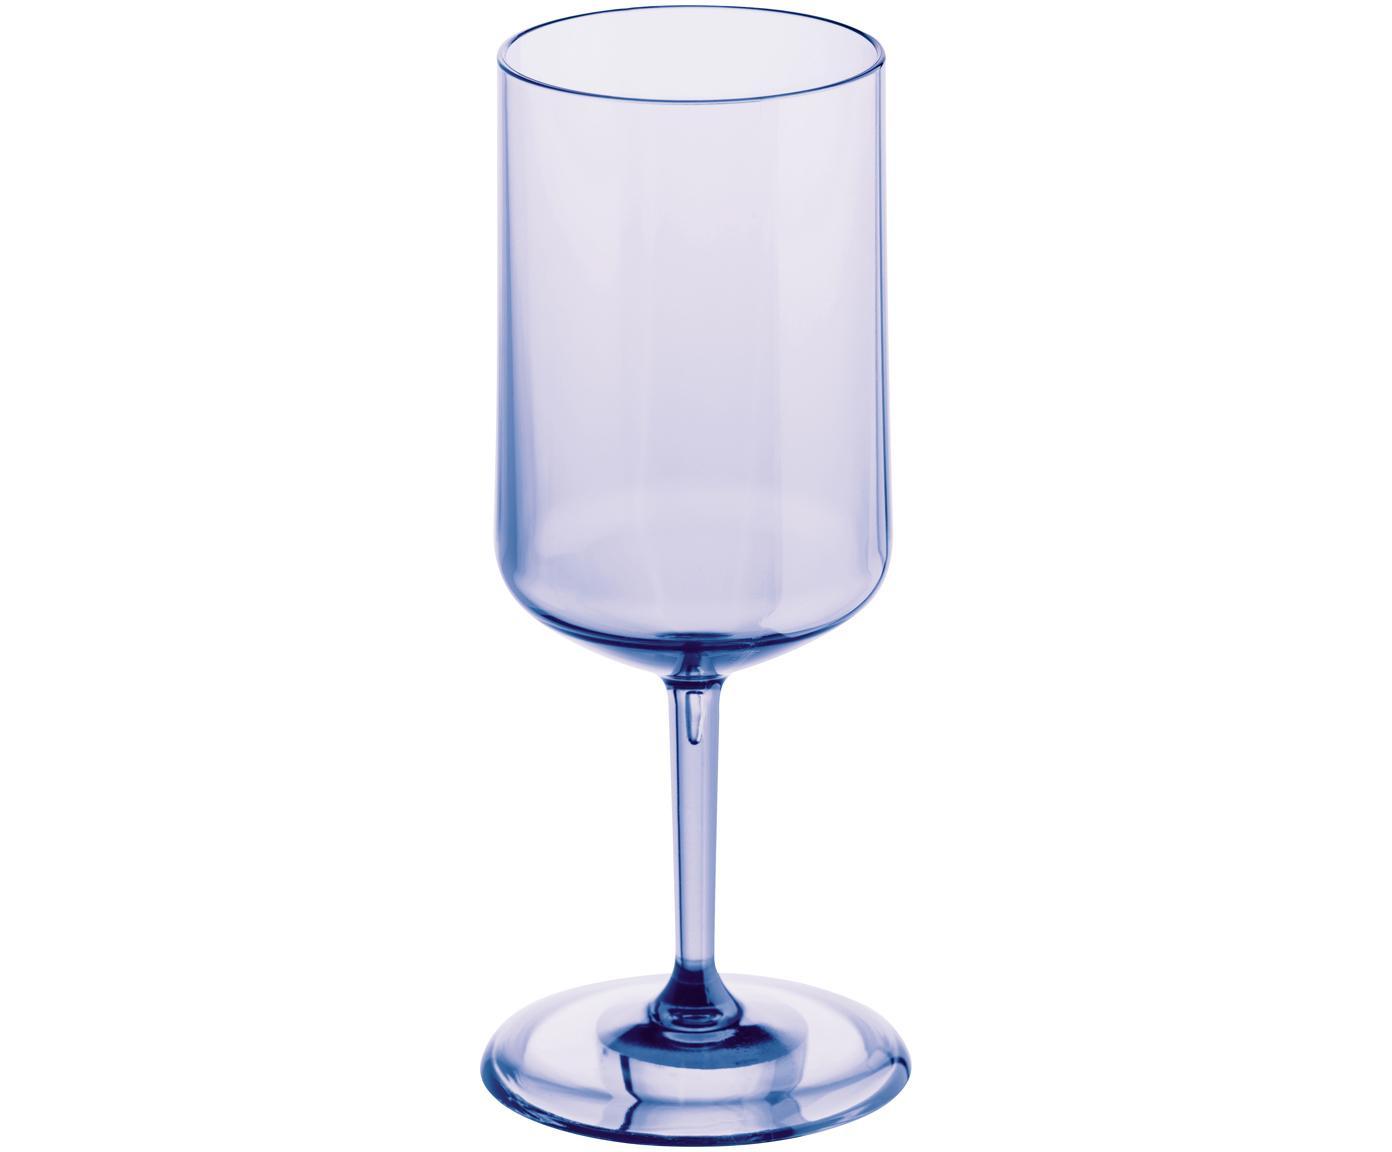 Bruchfestes Kunststoff-Weinglas Cheers, Thermoplastischer Kunststoff (Superglas), Blaulila, transparent, Ø 9 x H 21 cm